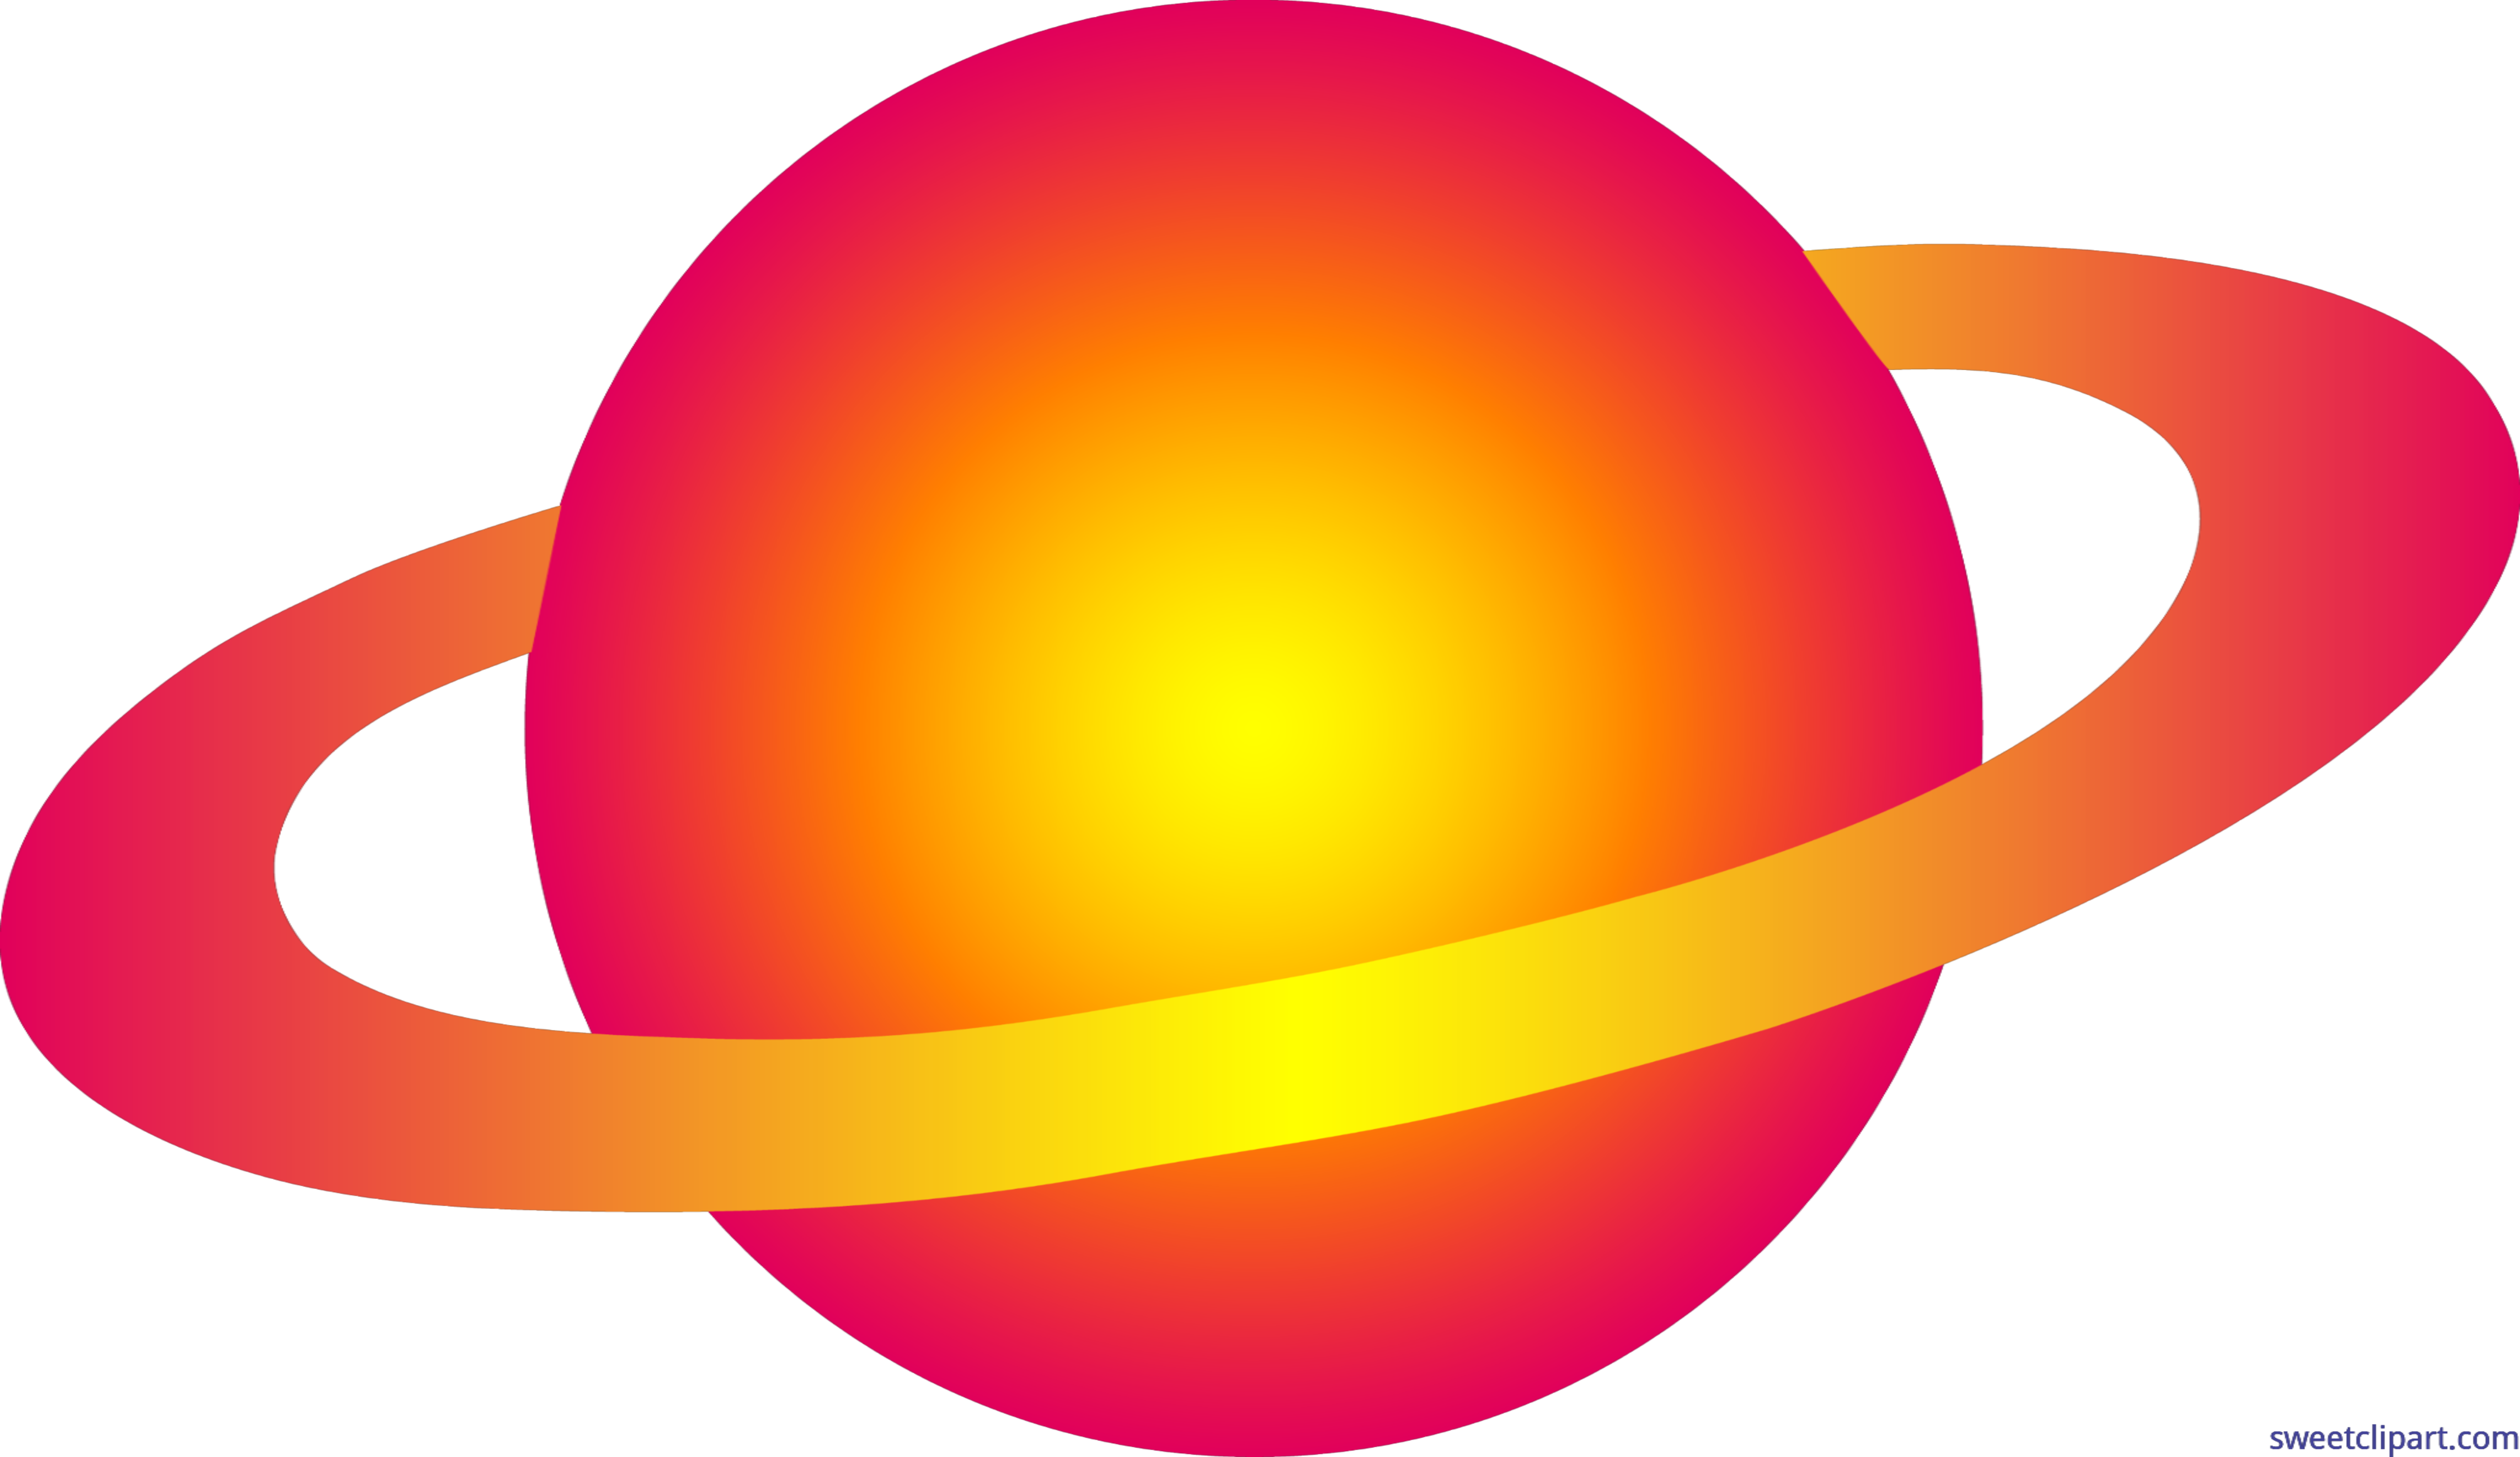 Apple planet clipart picture transparent download Planet Jupiter Clip art - both clipart 6071*3511 transprent Png Free ... picture transparent download